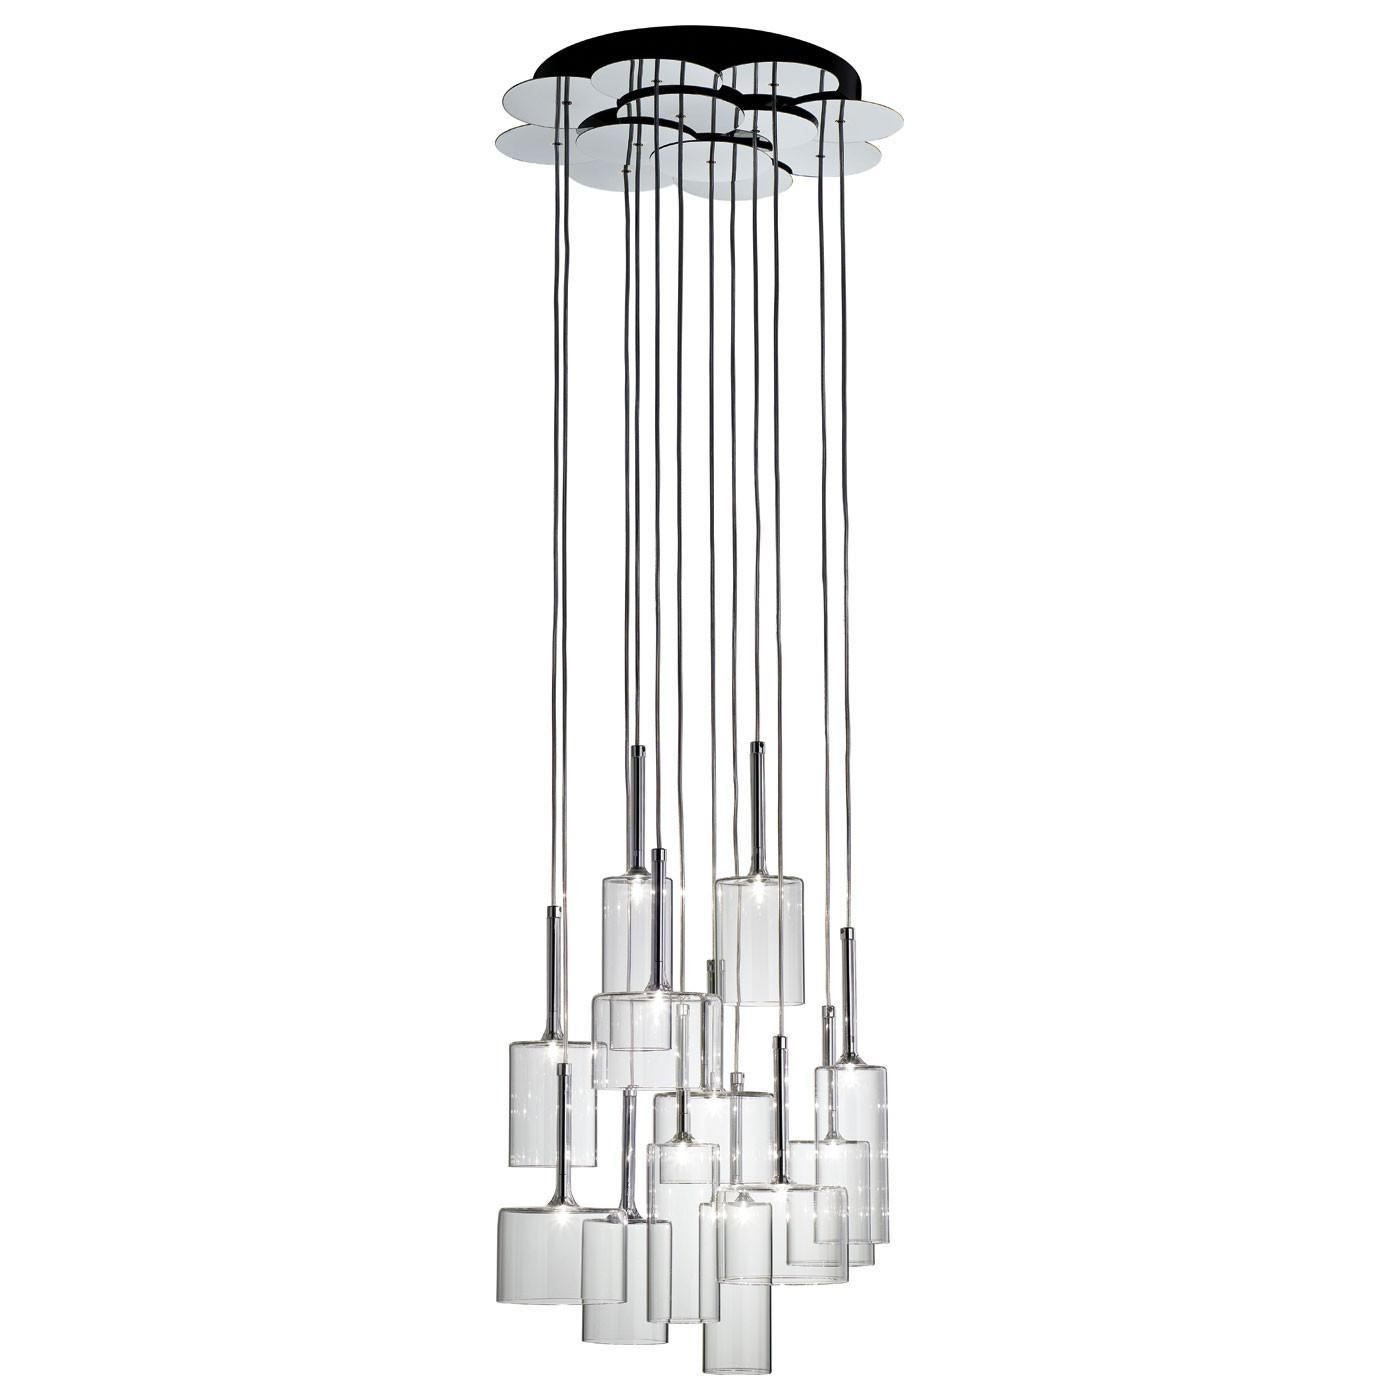 Axo Light Spillray SP12